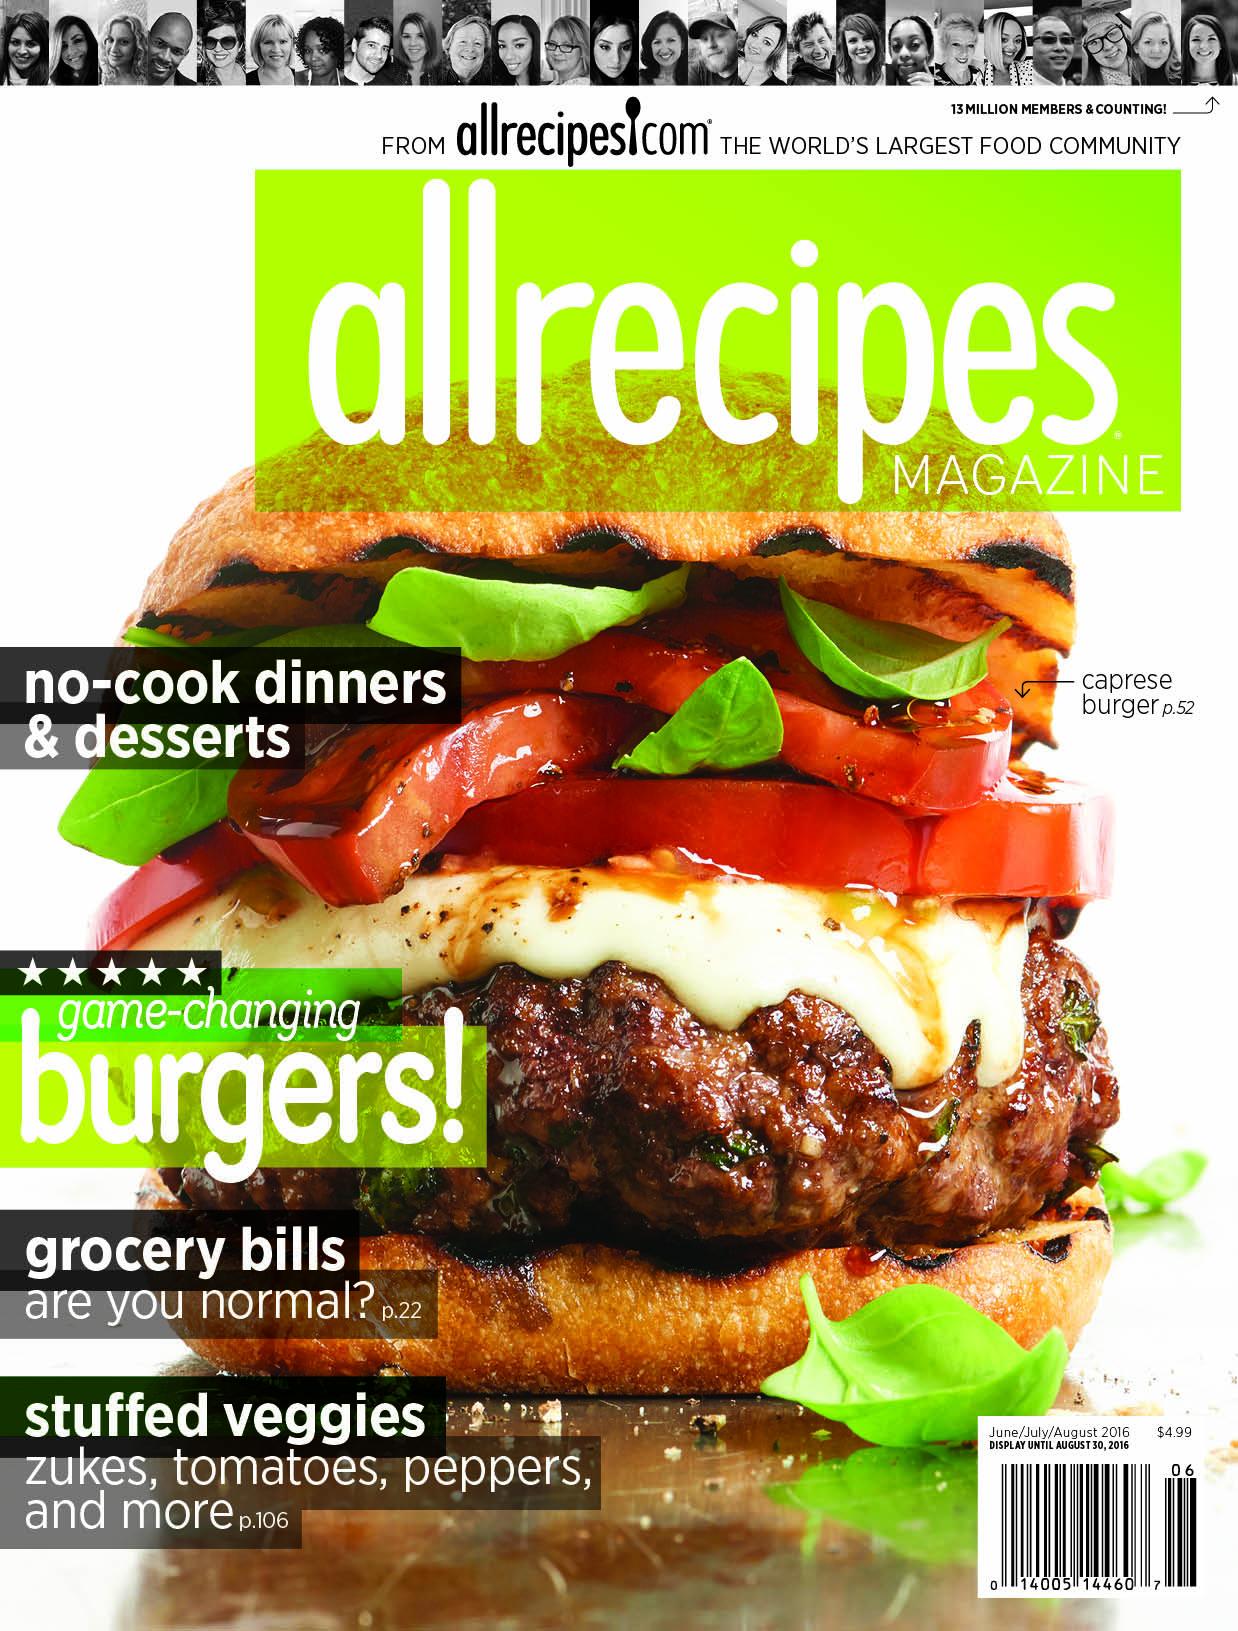 AllrecipesJJAcover_USnewsstand